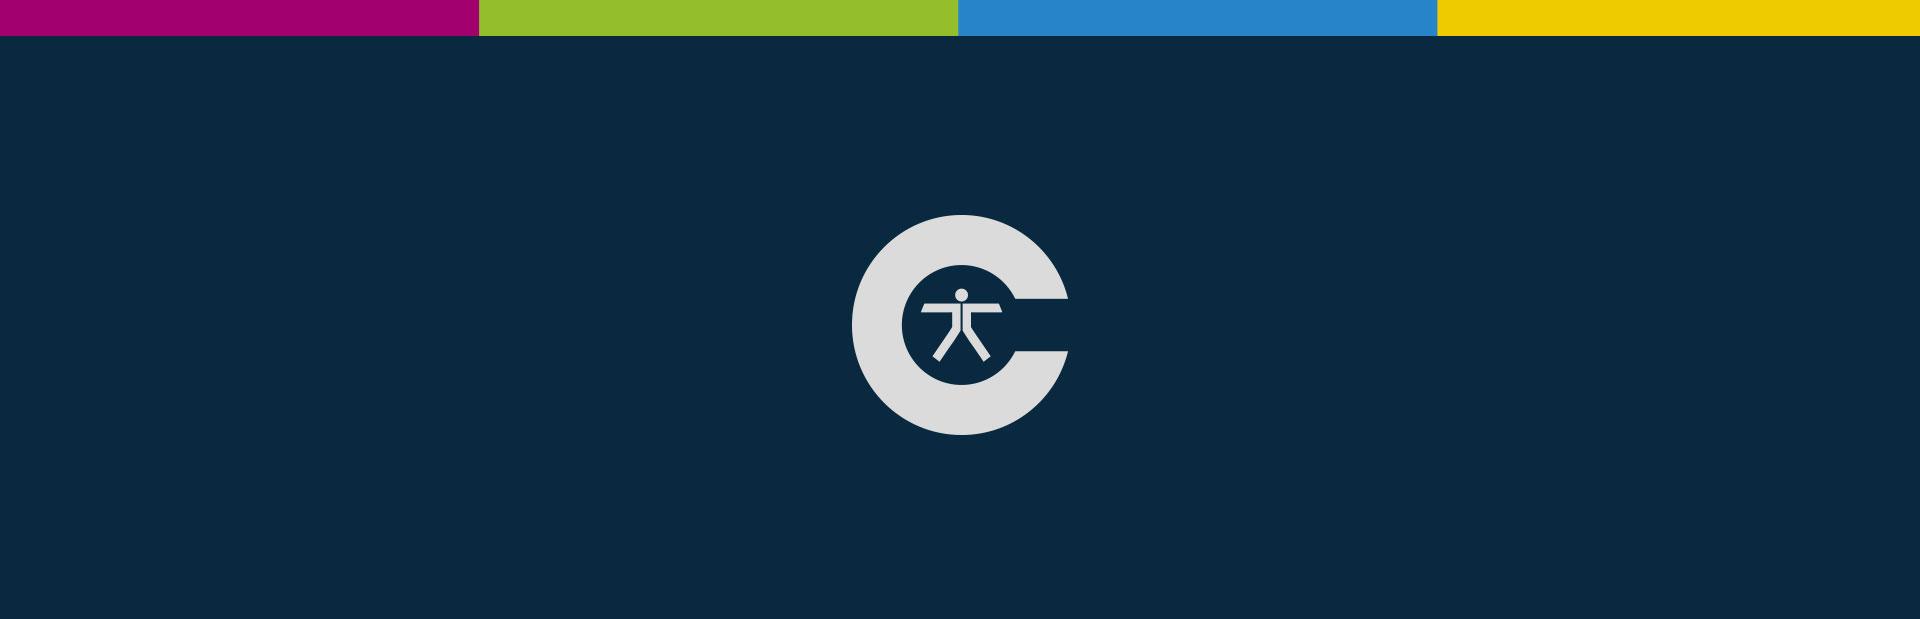 change-project-logo2-zerouno-design